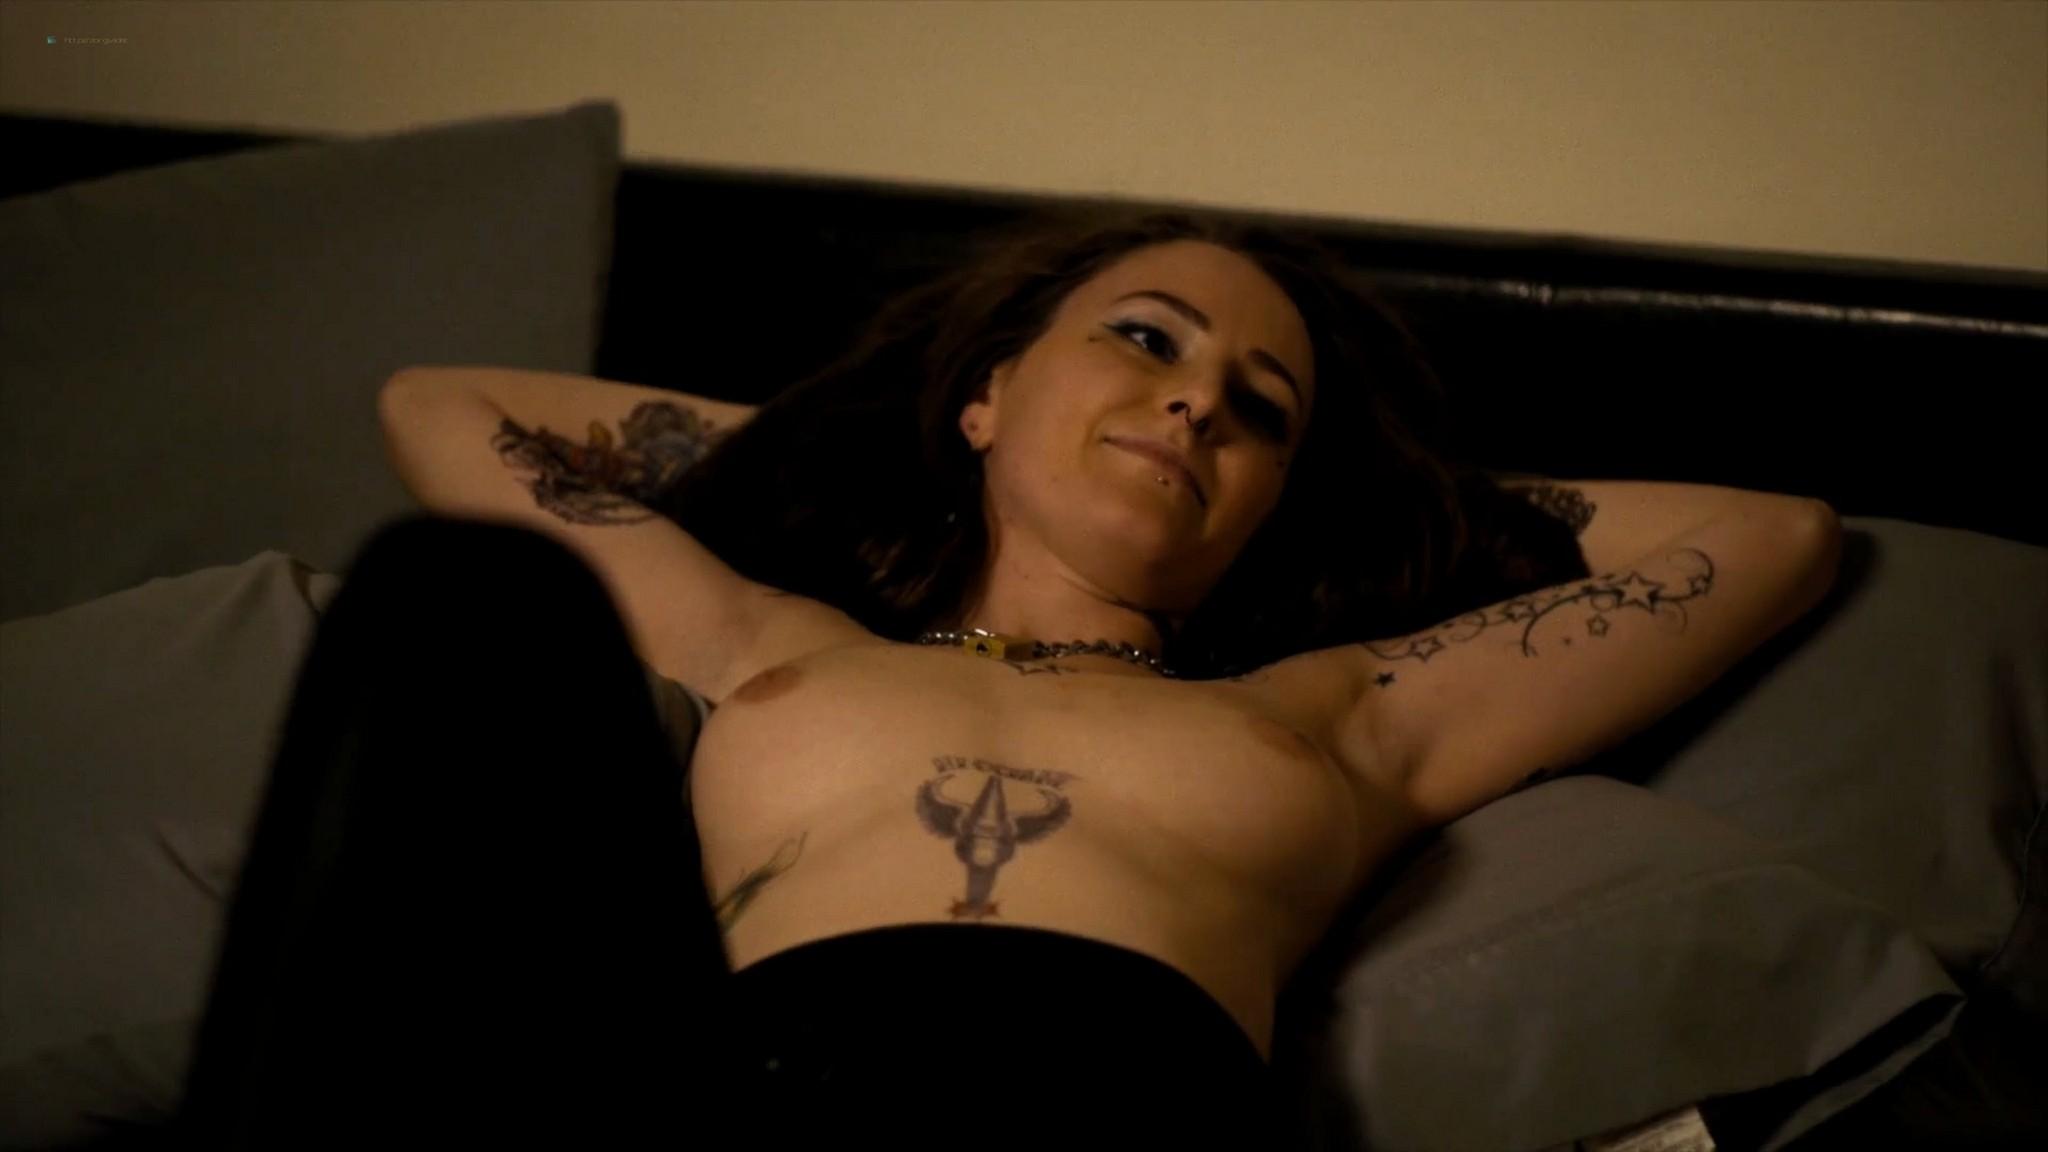 Sadie Katz nude lesbian sex with Victoria De Mare - Hanukkah (2019) HD 1080p Web (12)